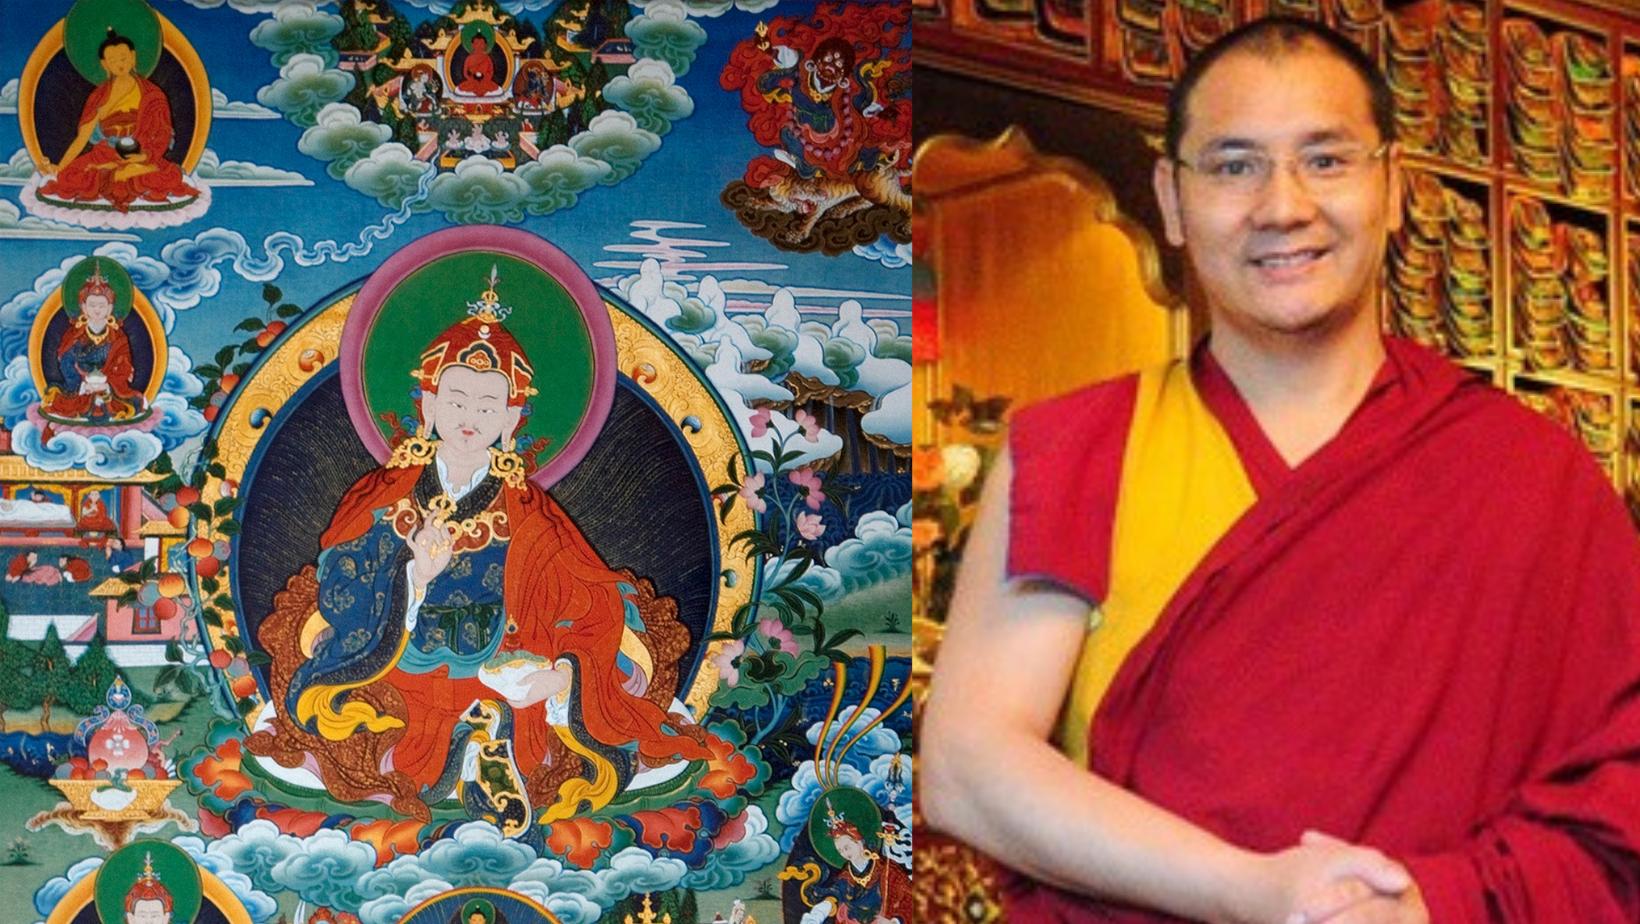 A PRAYER TO GURU RINPOCHE - Khenpo Tashi Sangpo